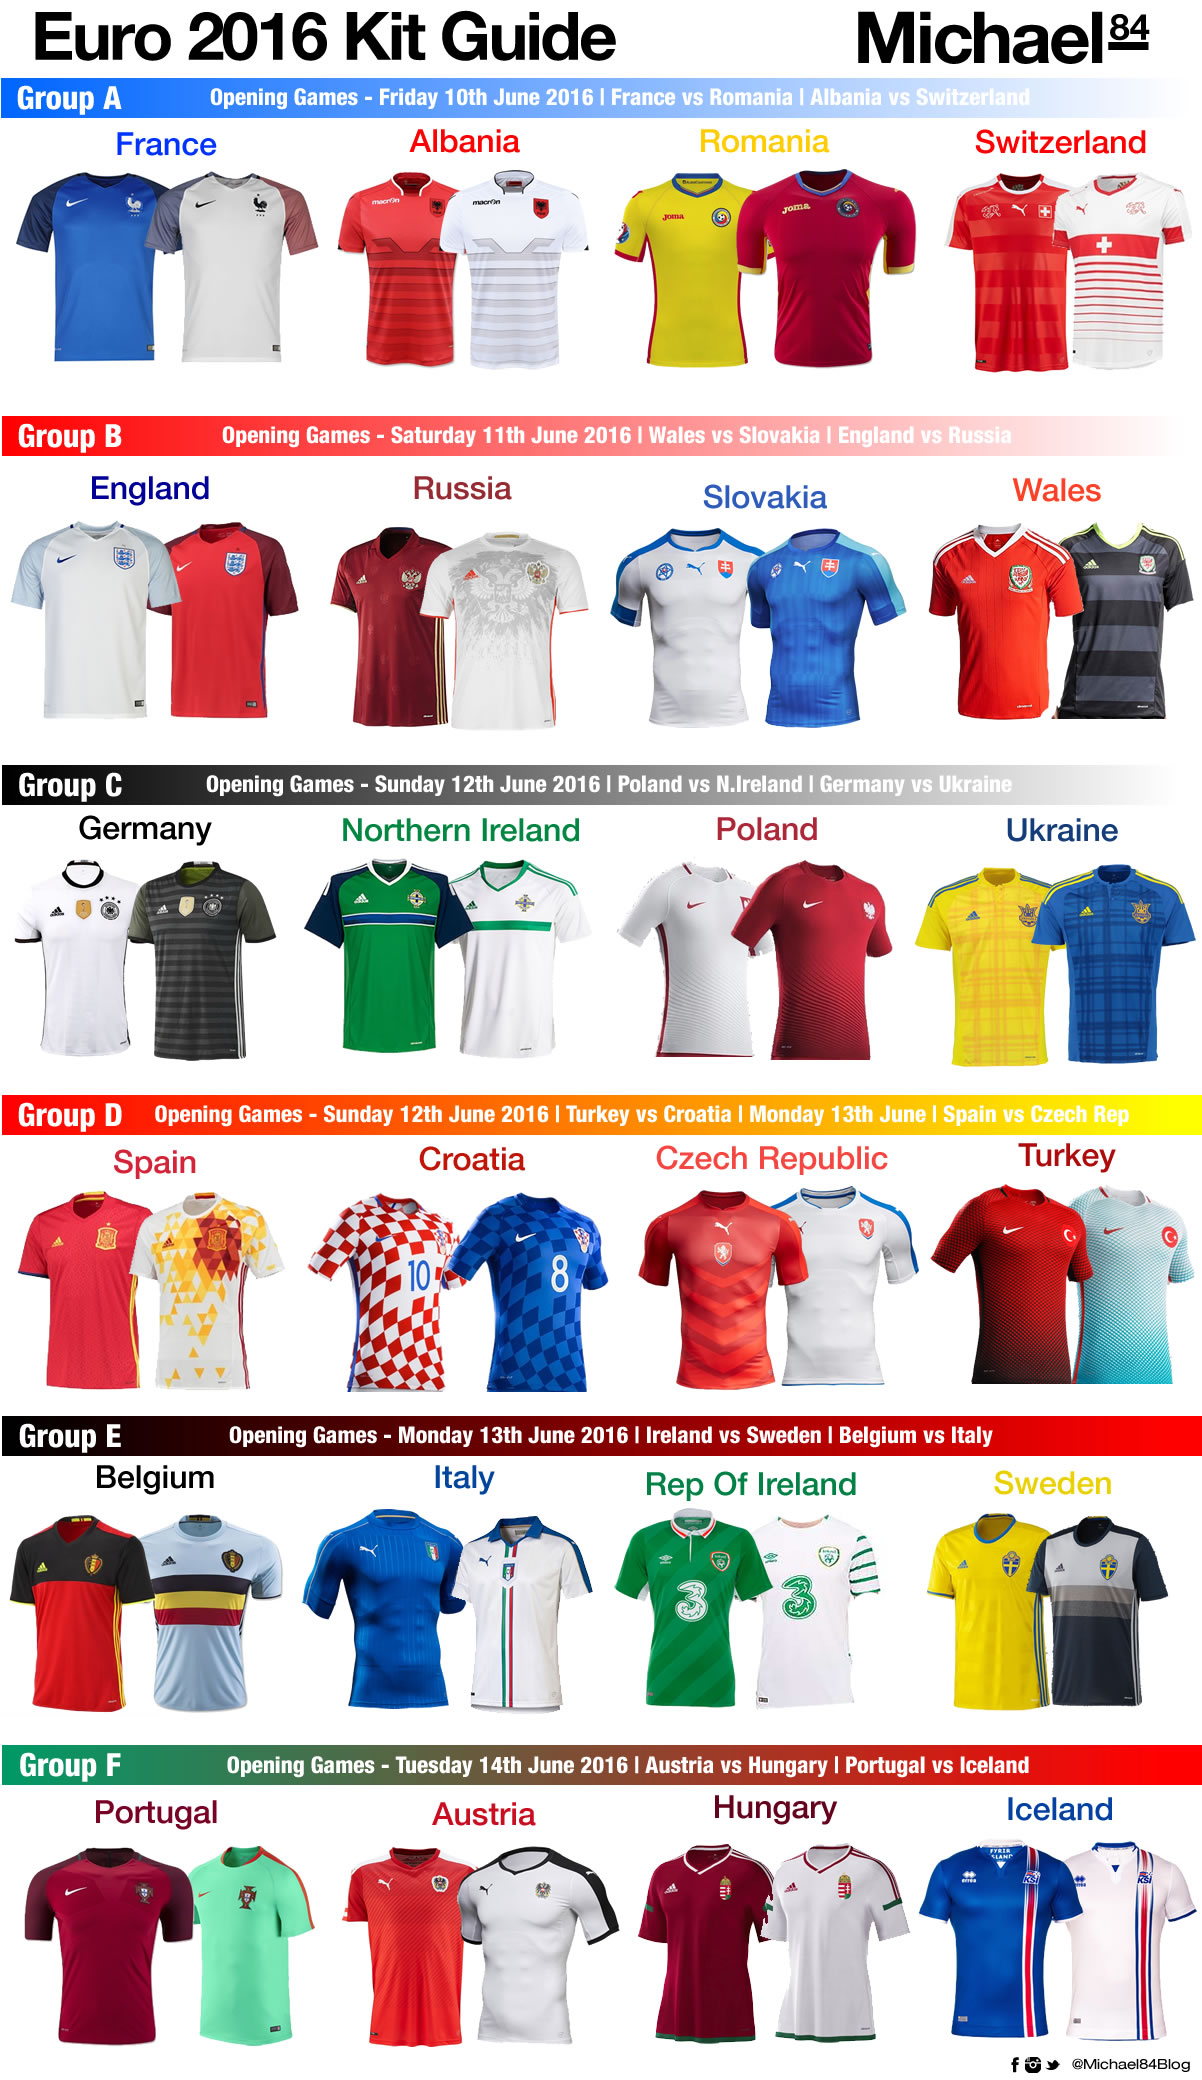 5f34dc080ed euro2016-kit-guide-home-away-shirts